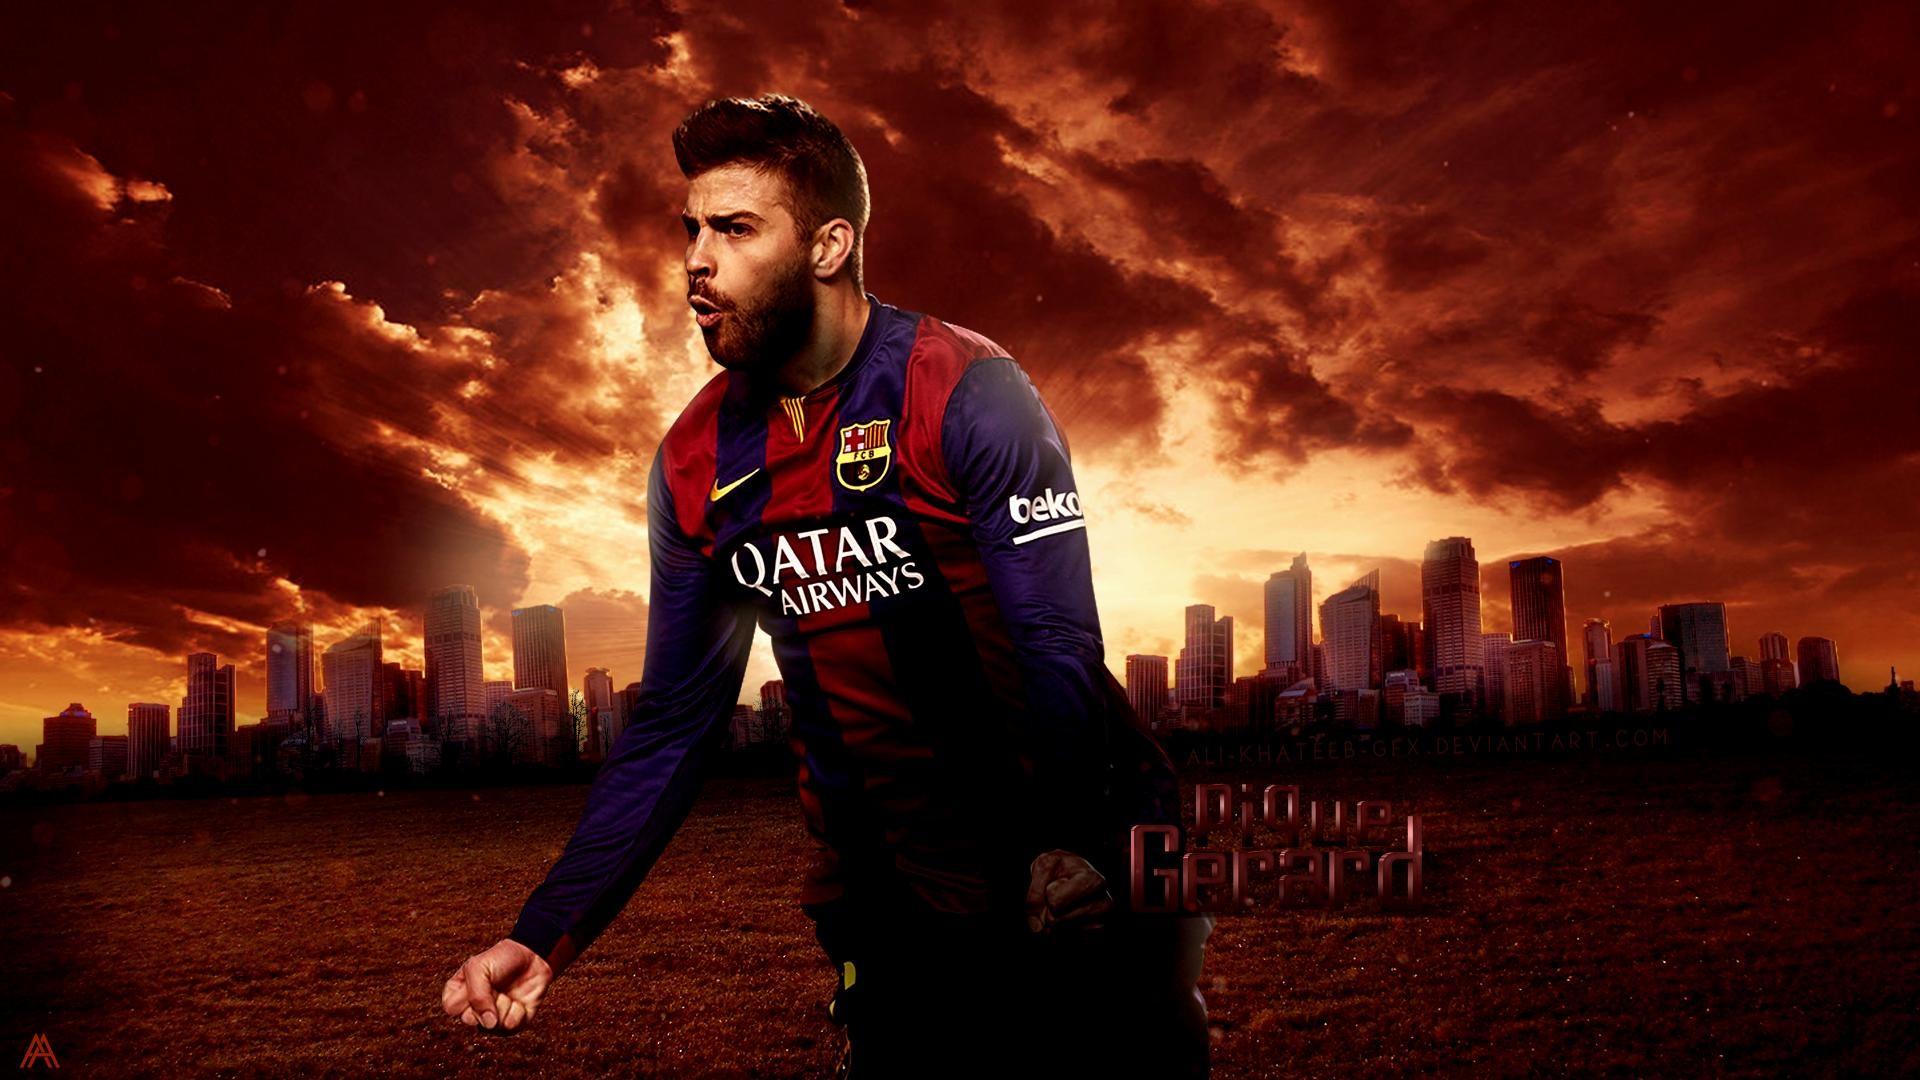 Gerard-Pique-FC-Barcelona-Club-Player-Wallpaper-1